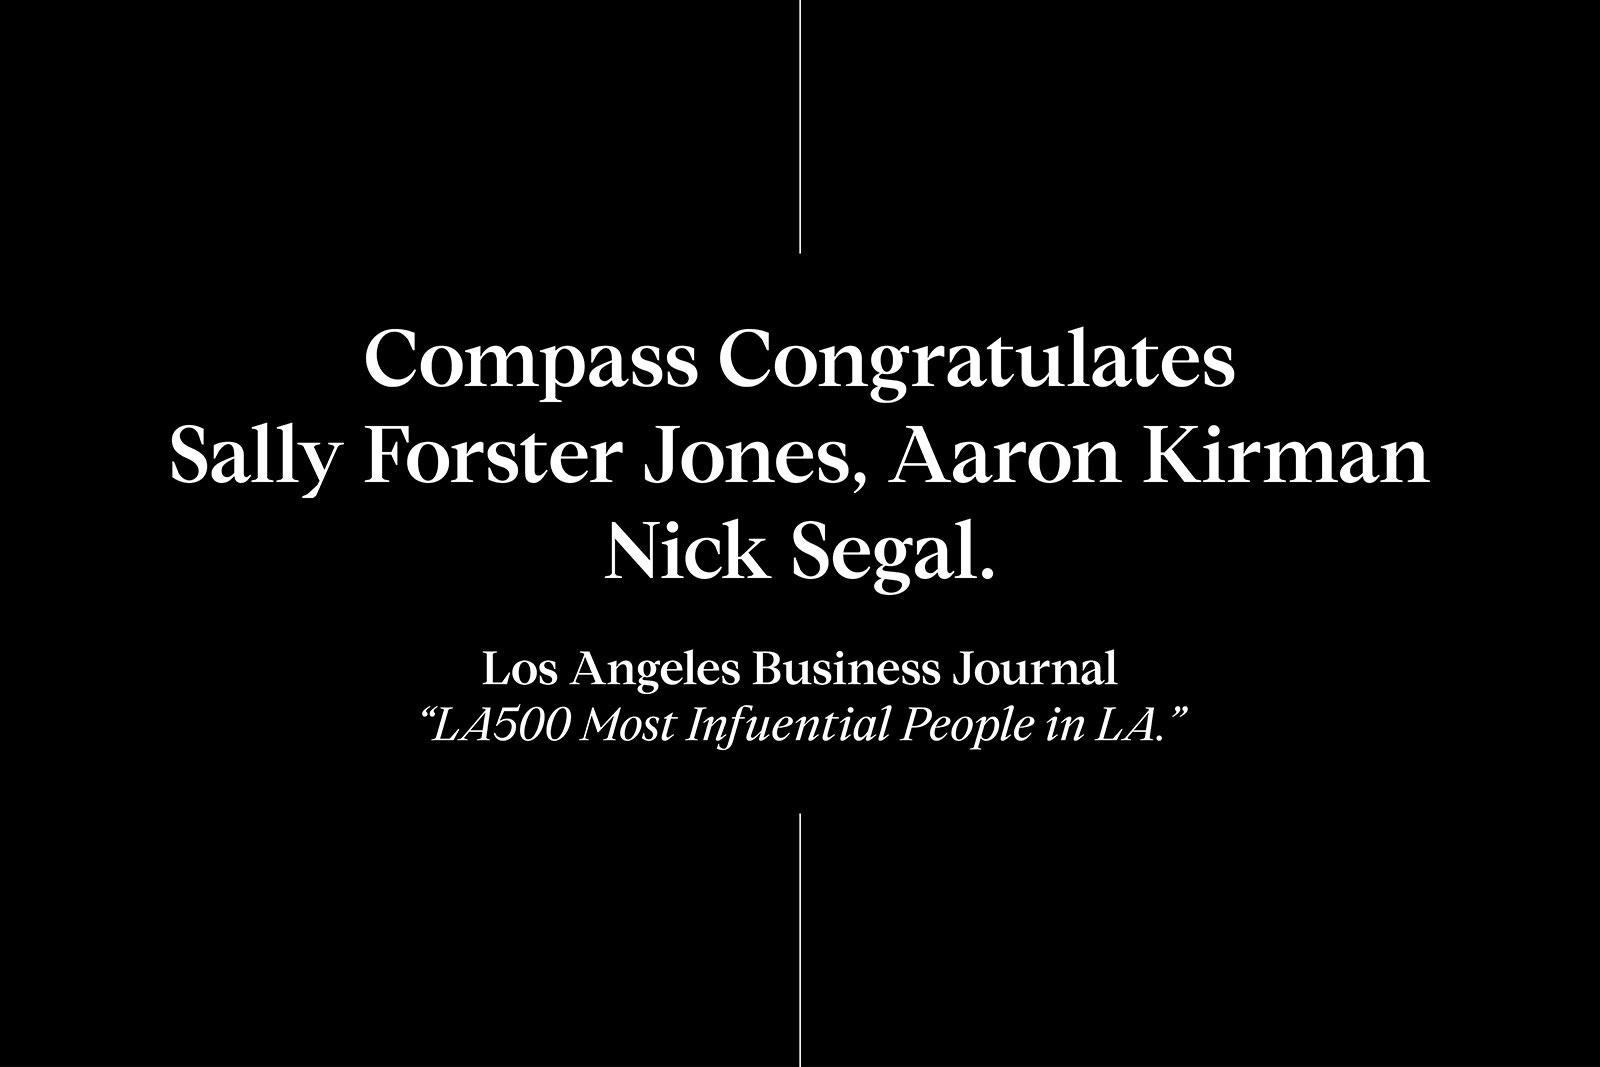 compass congratulations